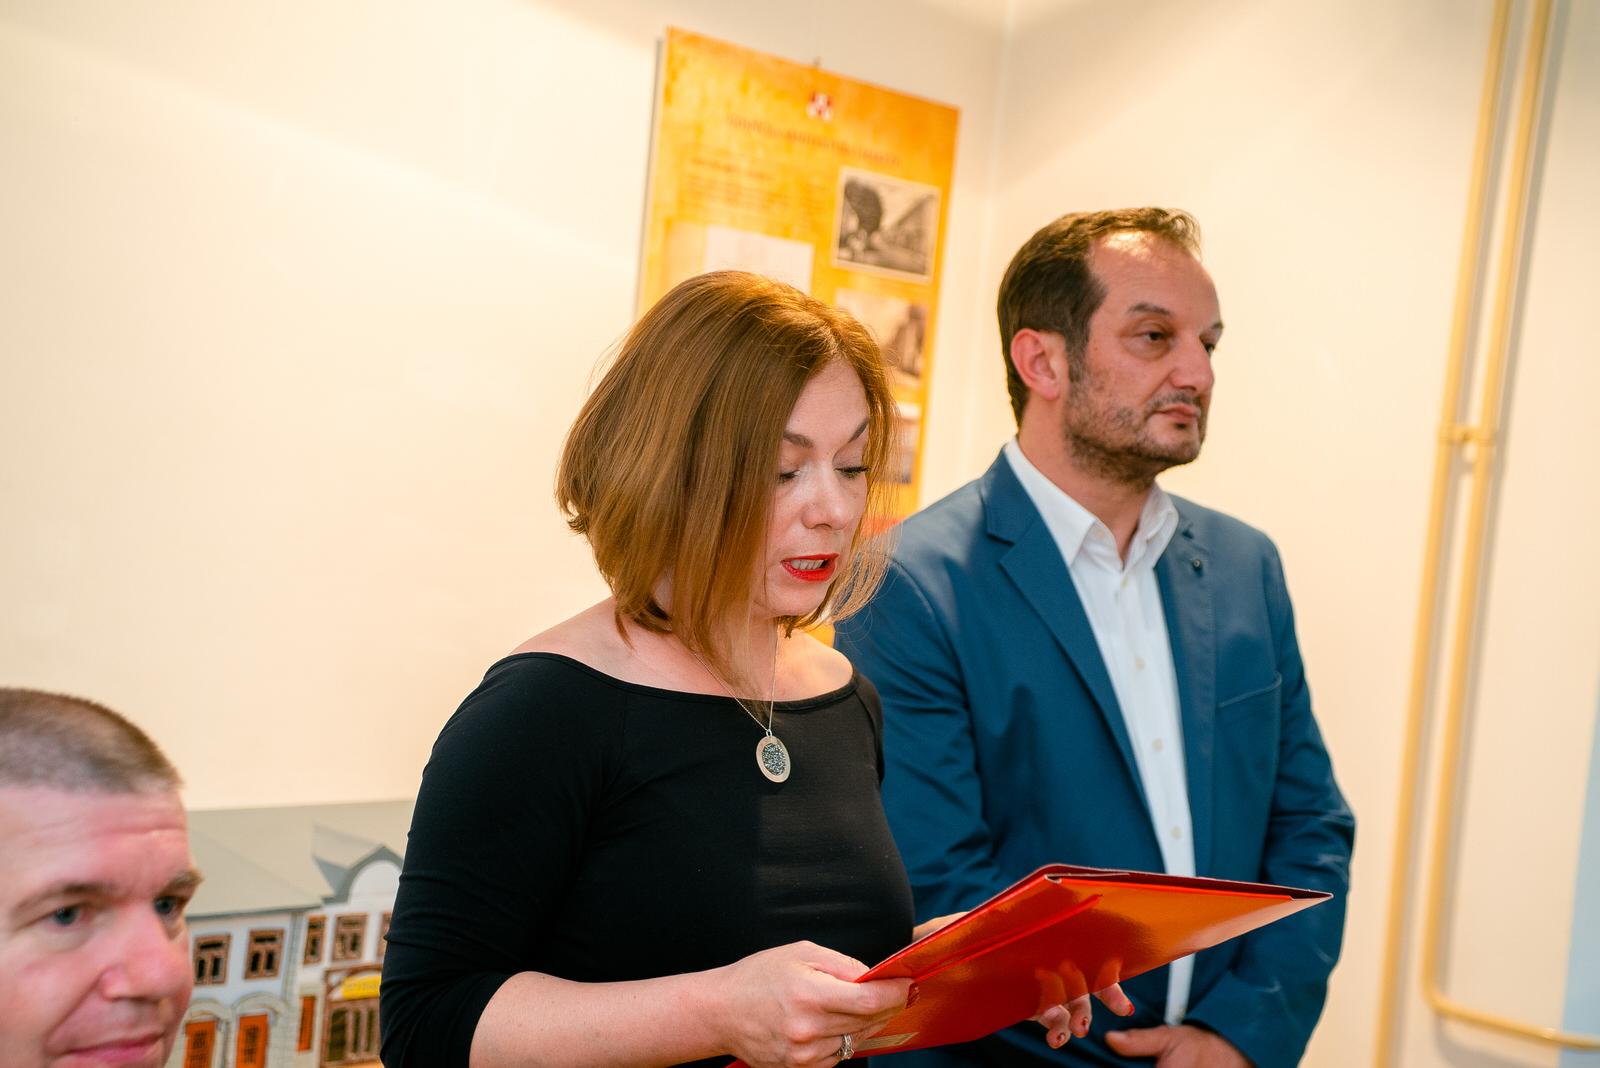 likaclub_gospić_izložba-maketa-i-modela-državni-arhiv_2019-18